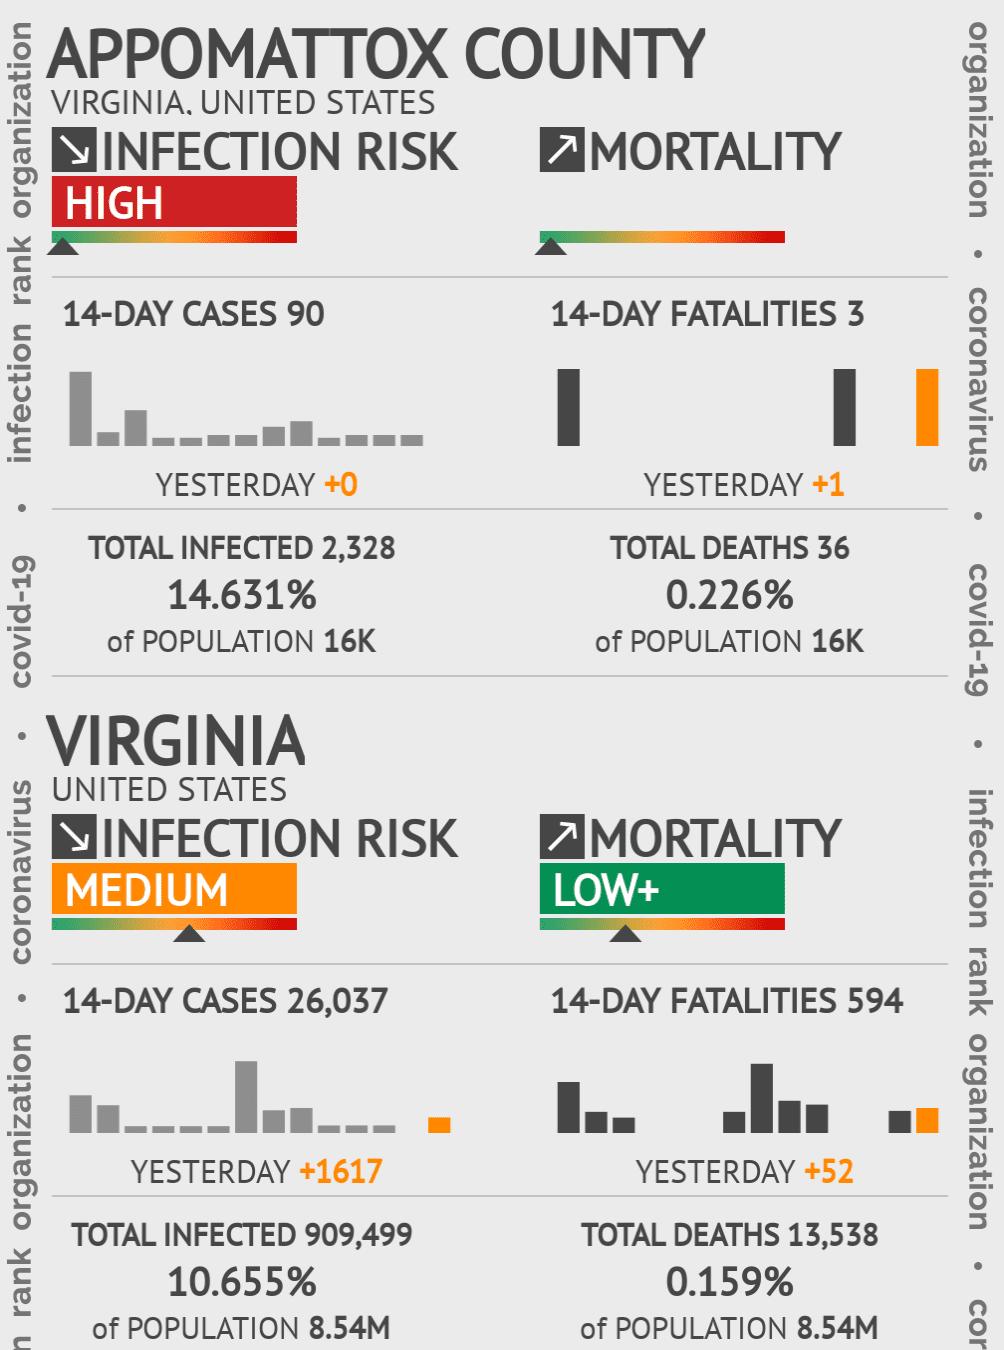 Appomattox County Coronavirus Covid-19 Risk of Infection on July 24, 2021